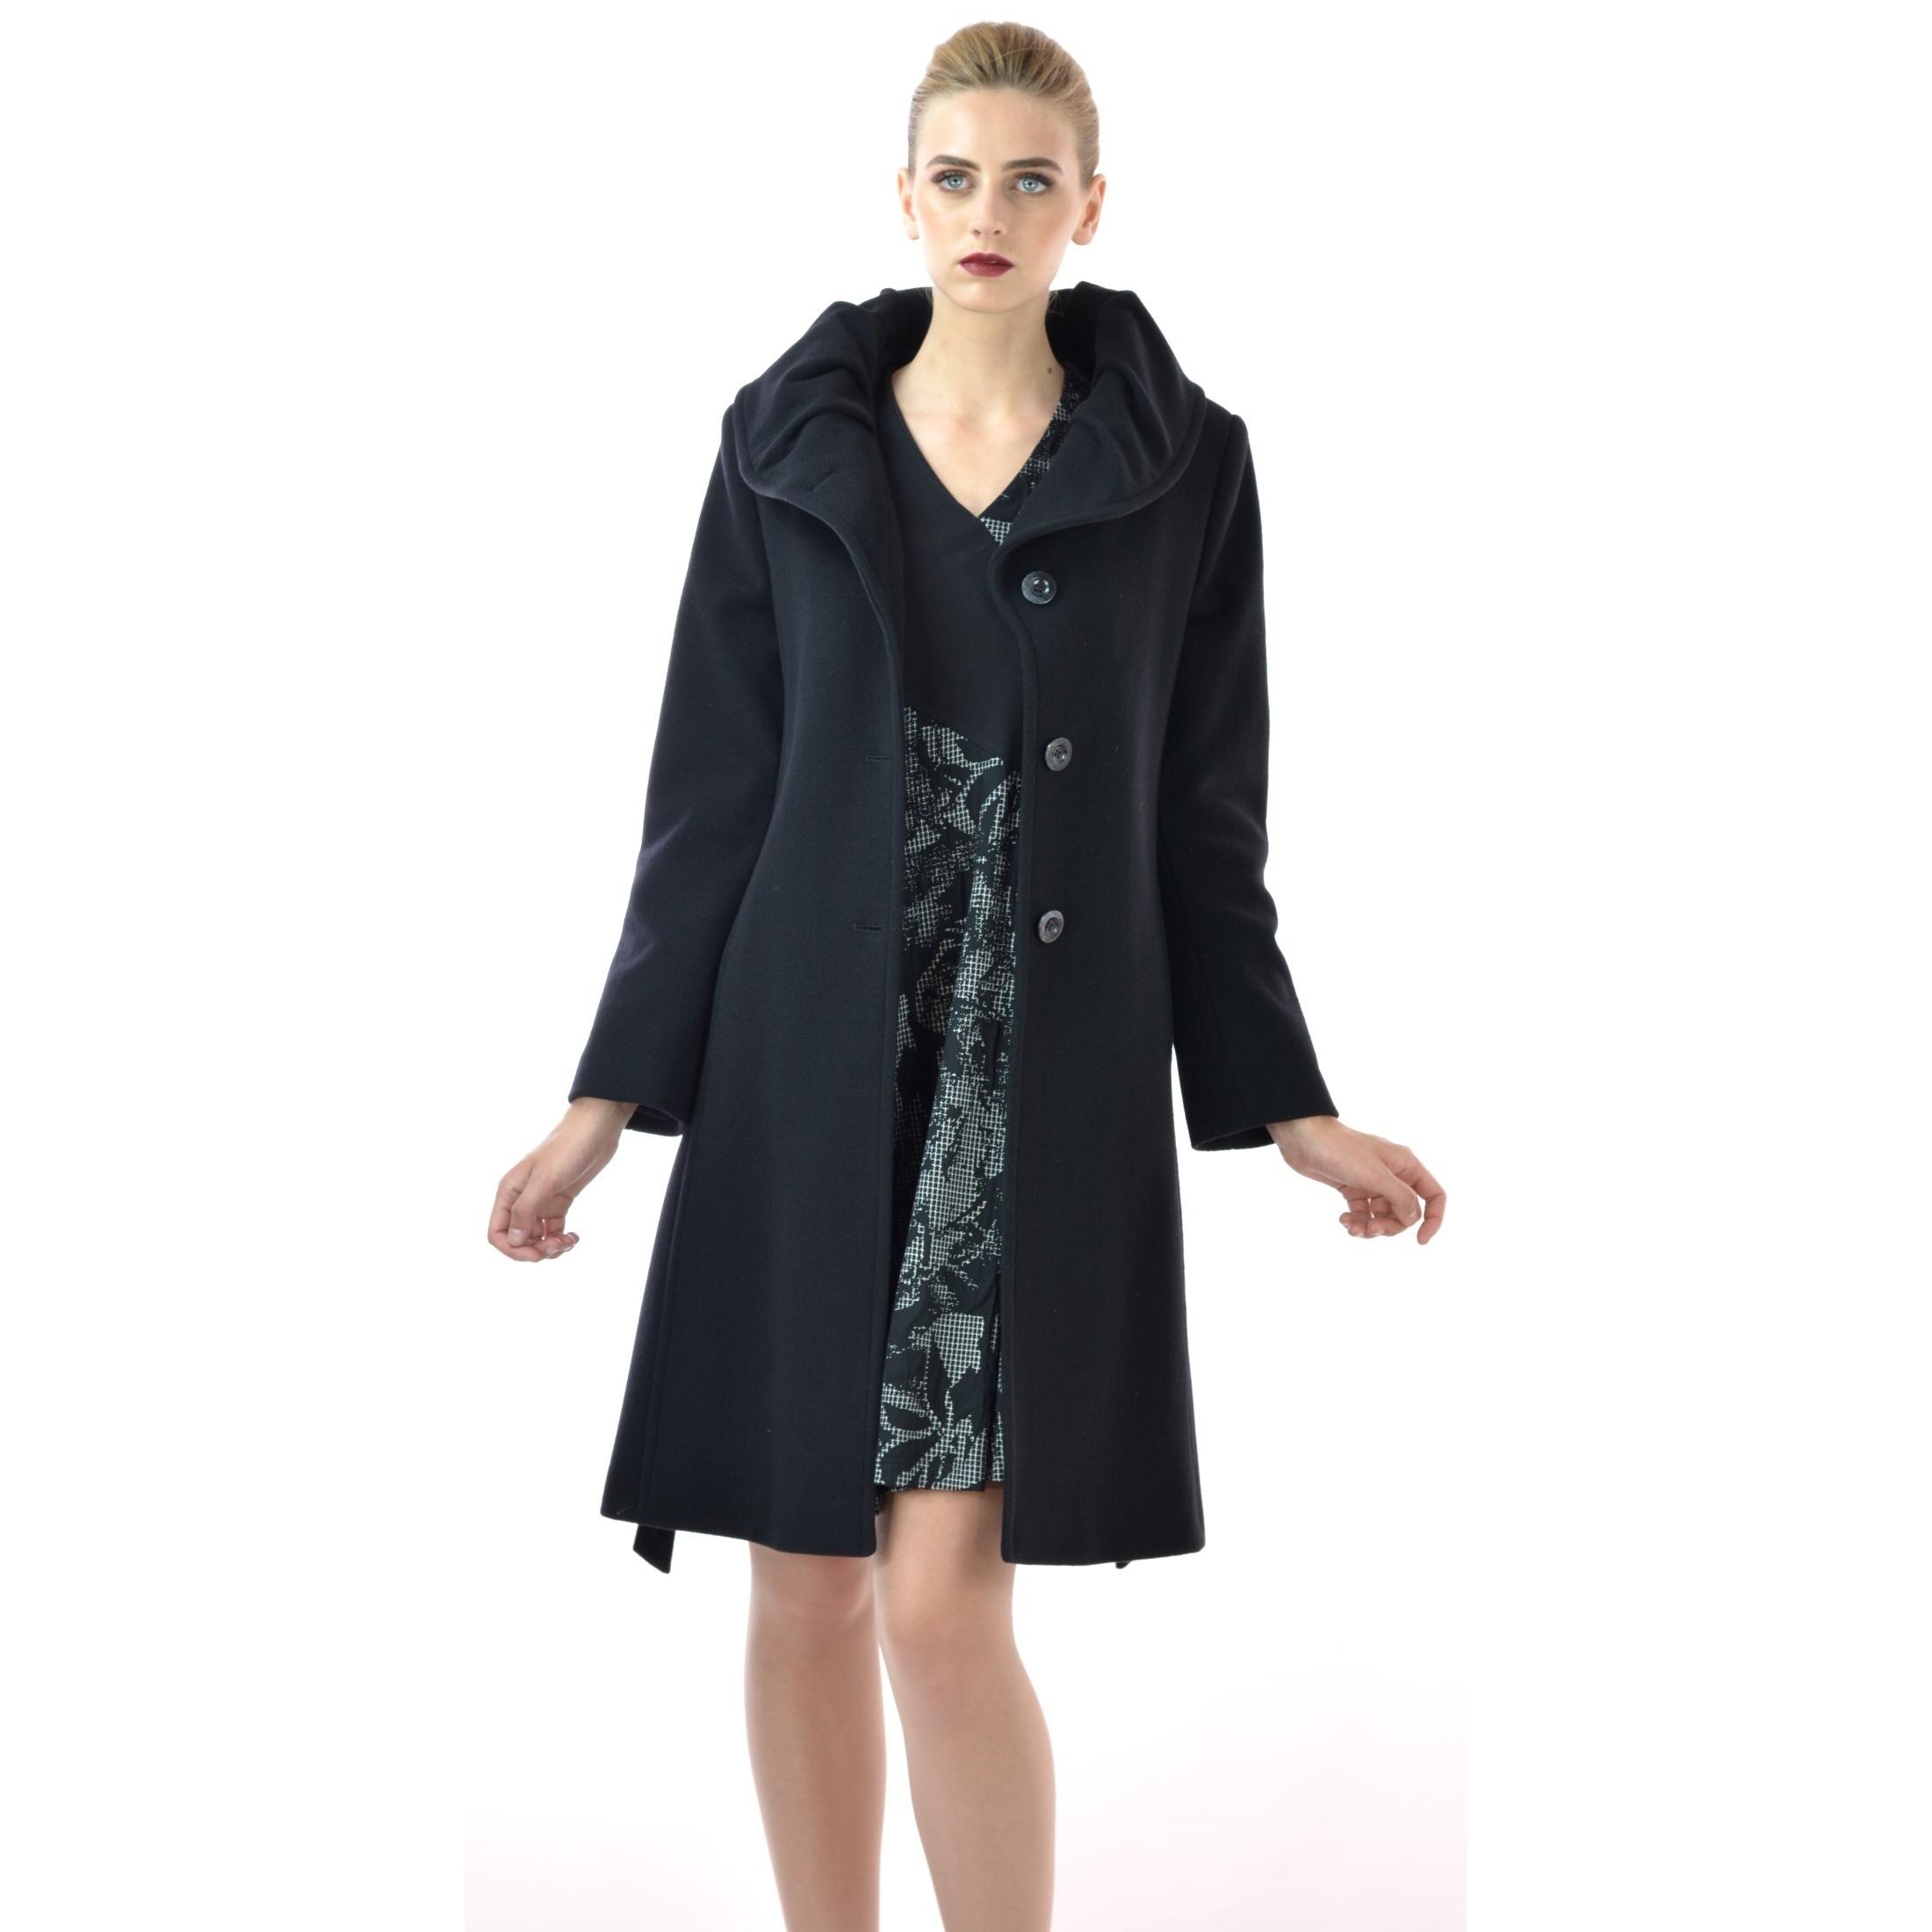 Picture of Women's Coat - M60163